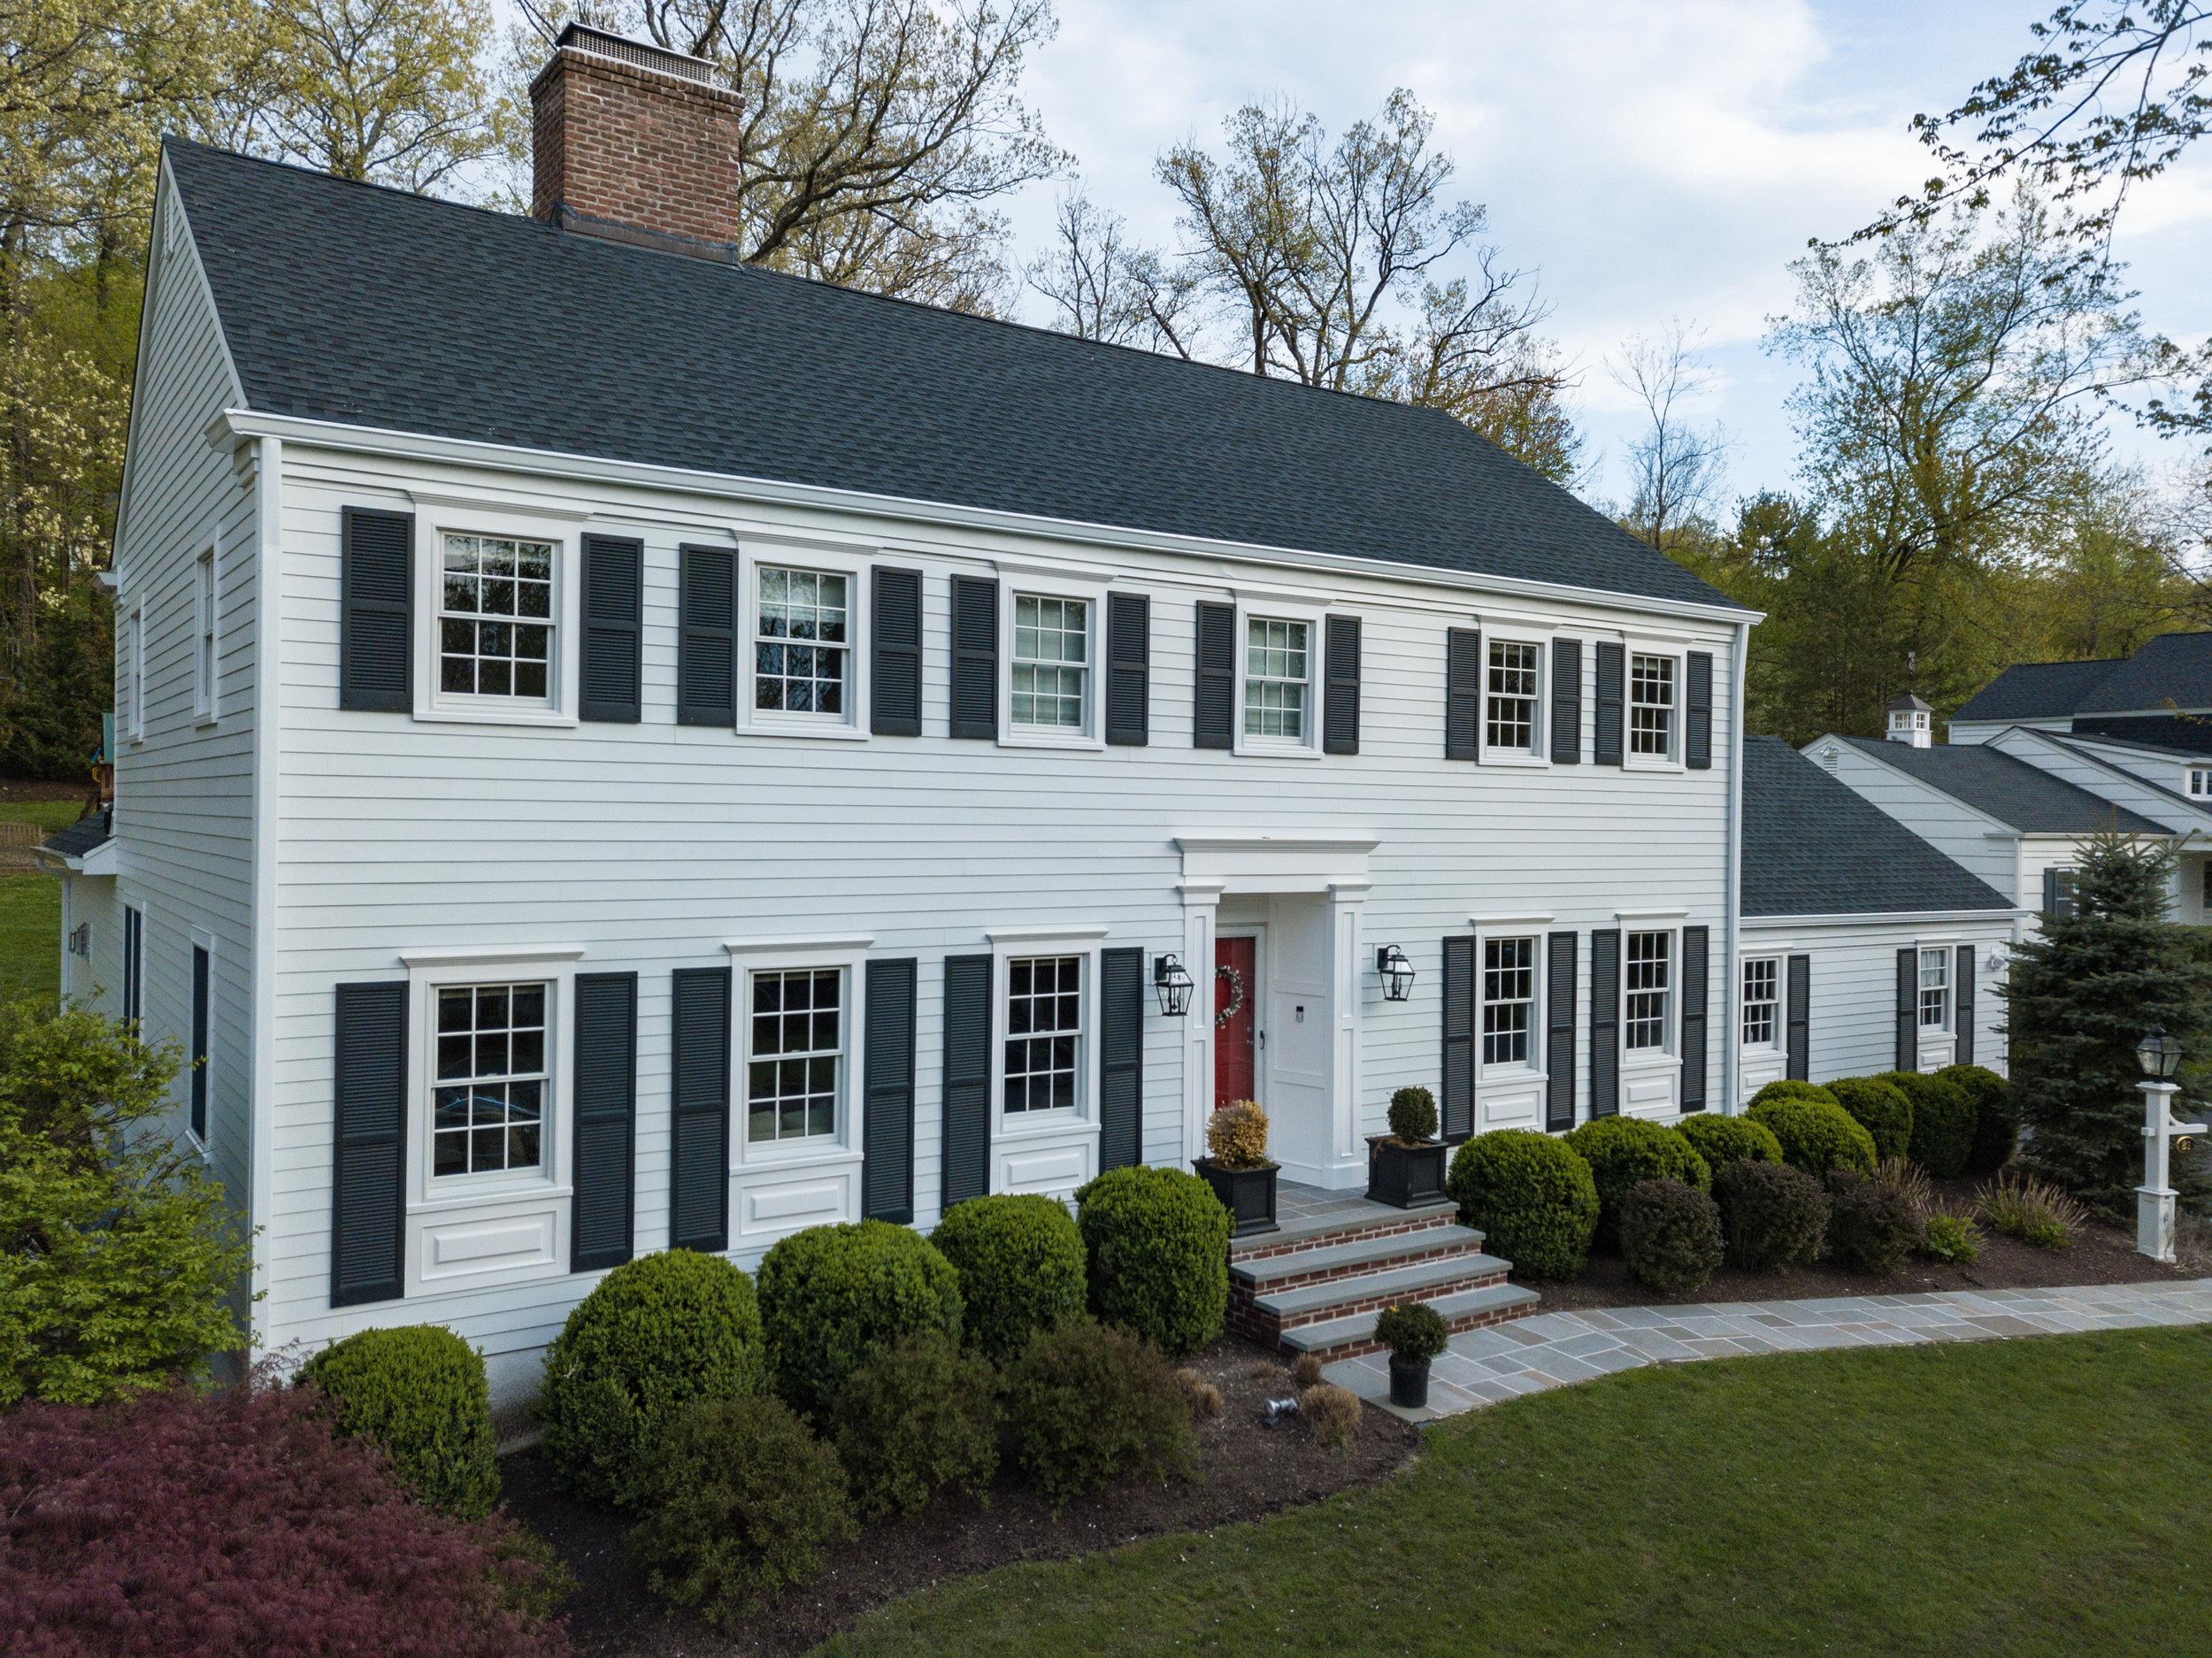 Chatham-HomeRemodeling-GAF-Roofing-JamesHarideSiding-AndersonWindows